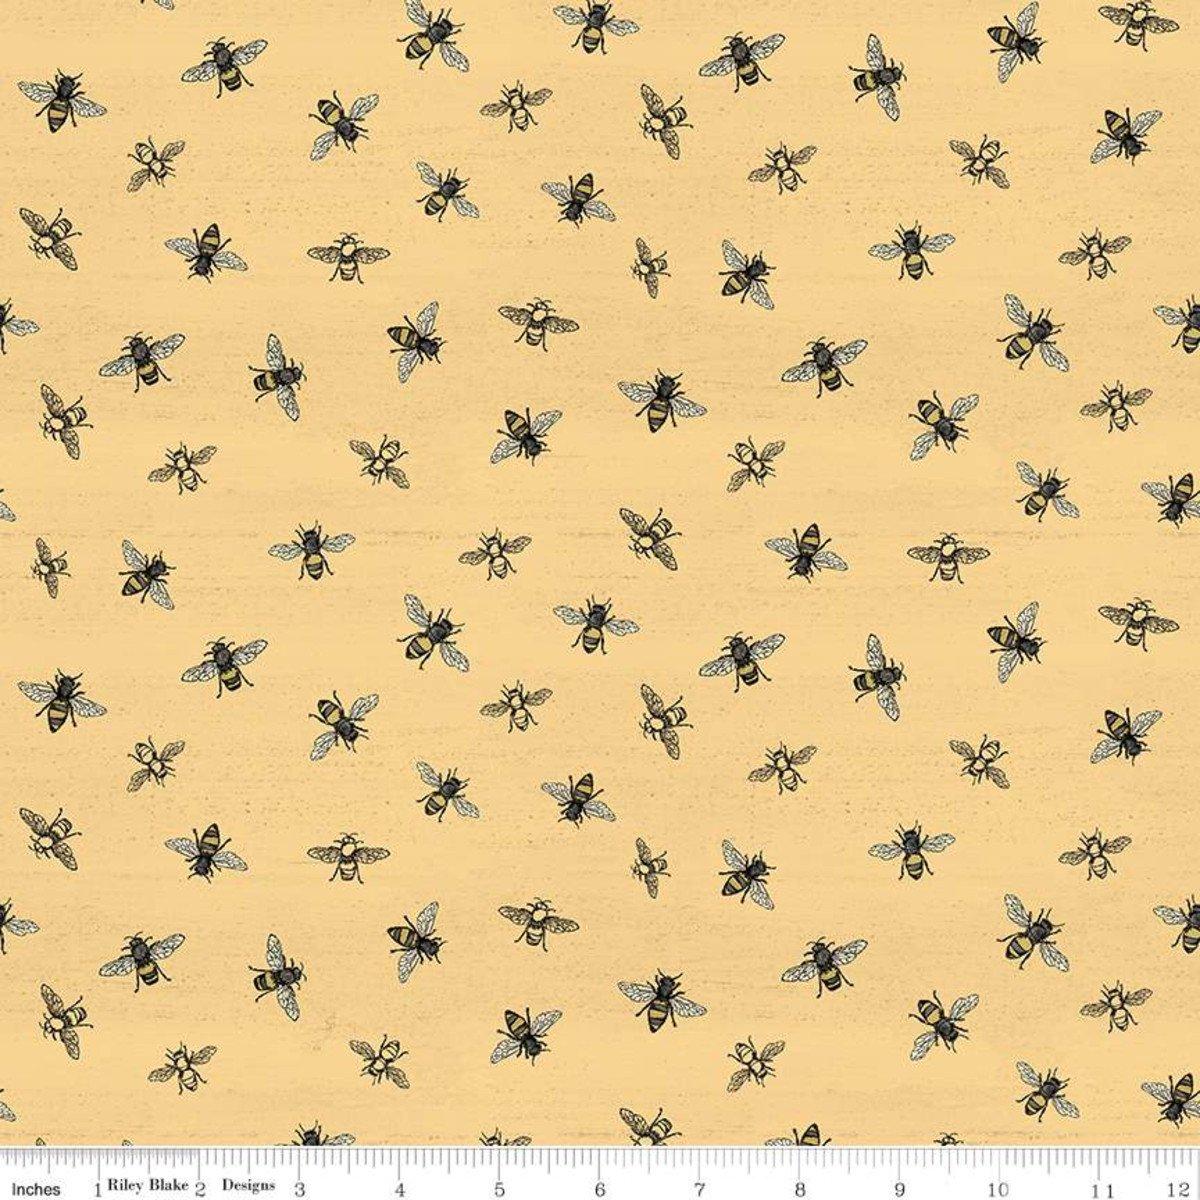 Riley Blake Bee's Life bees on yellow